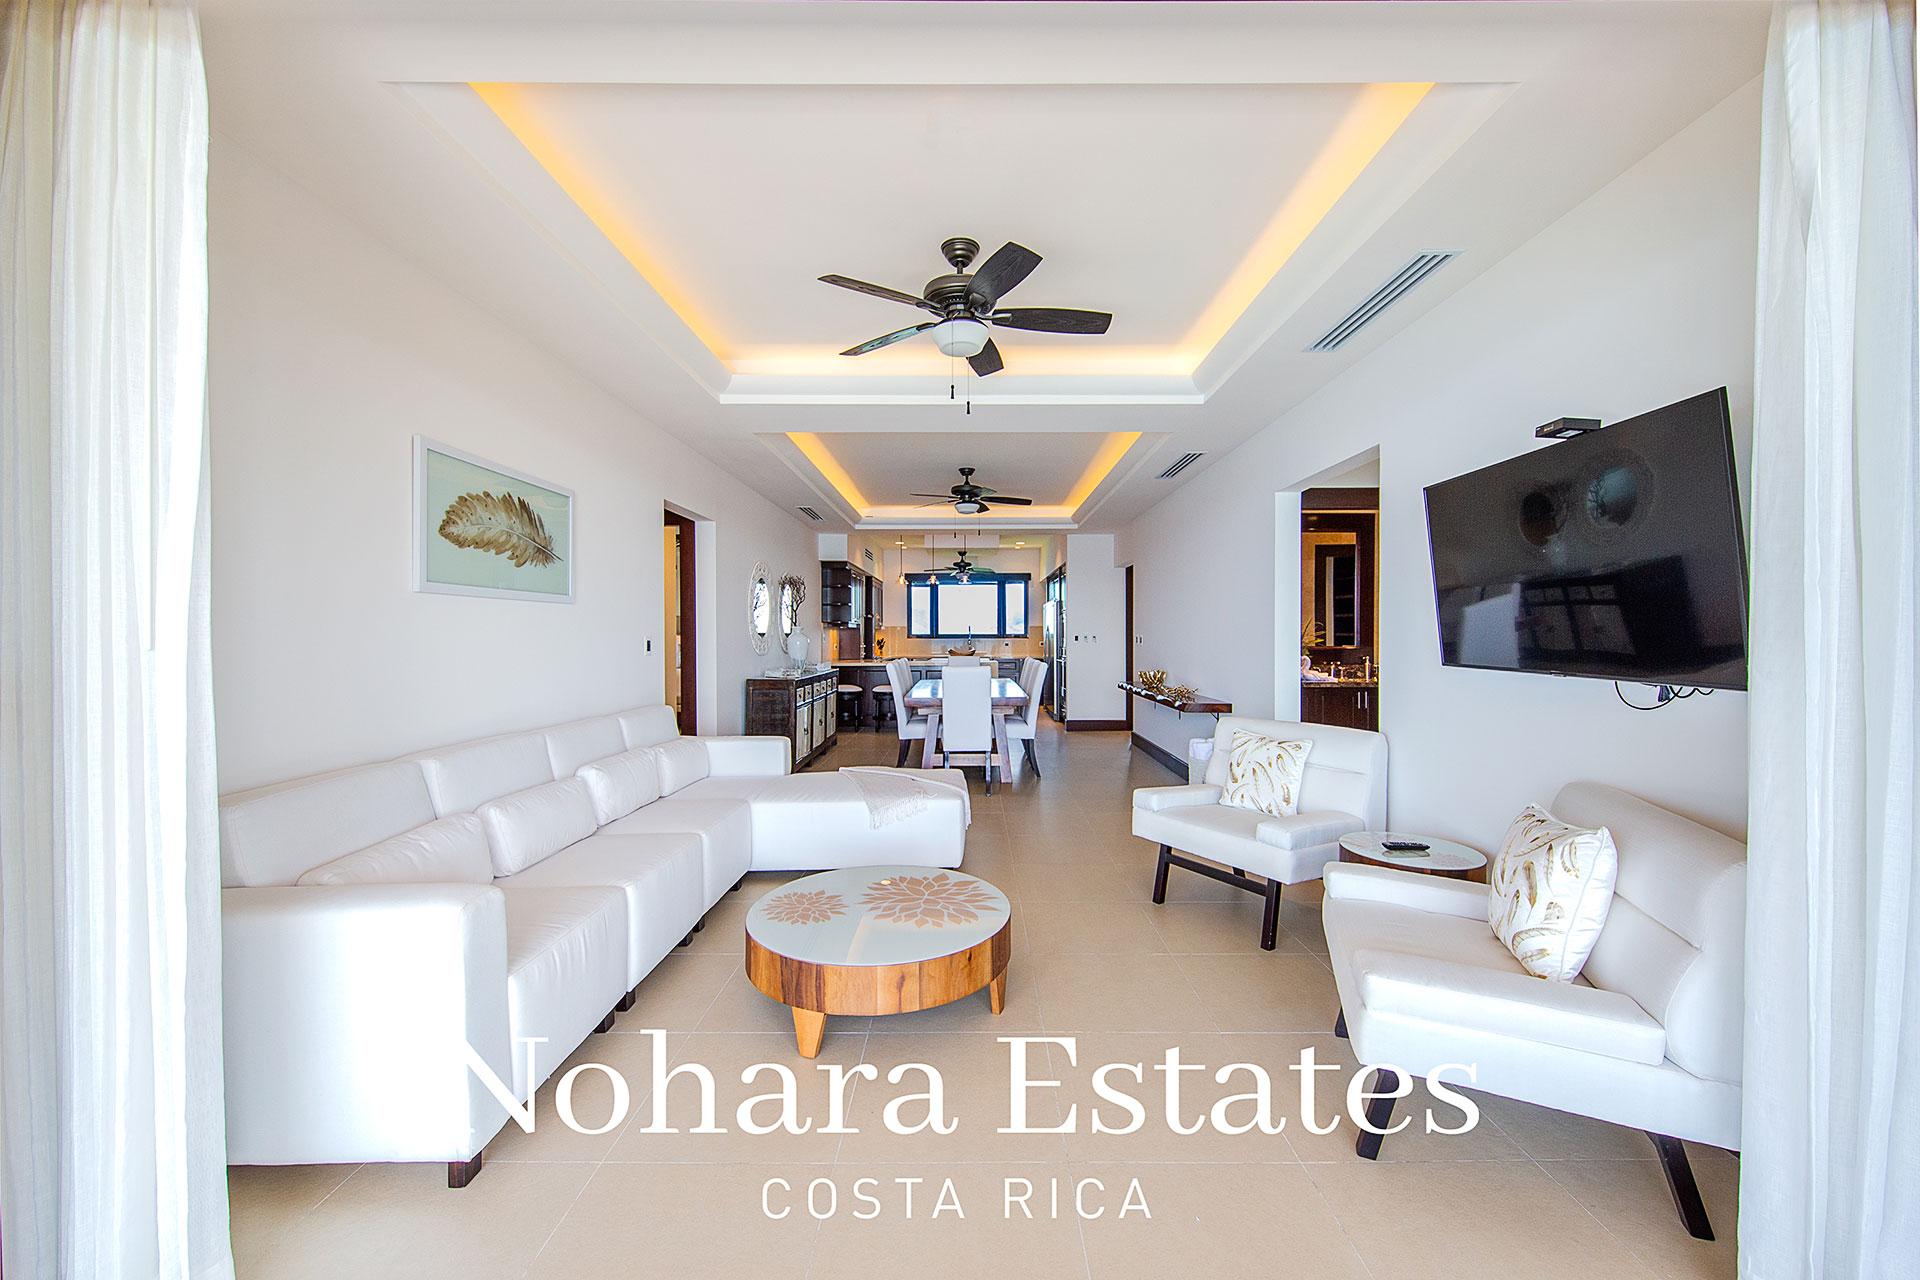 Nohara Estates Costa Rica 360 Esplendor Del Pacifico 2